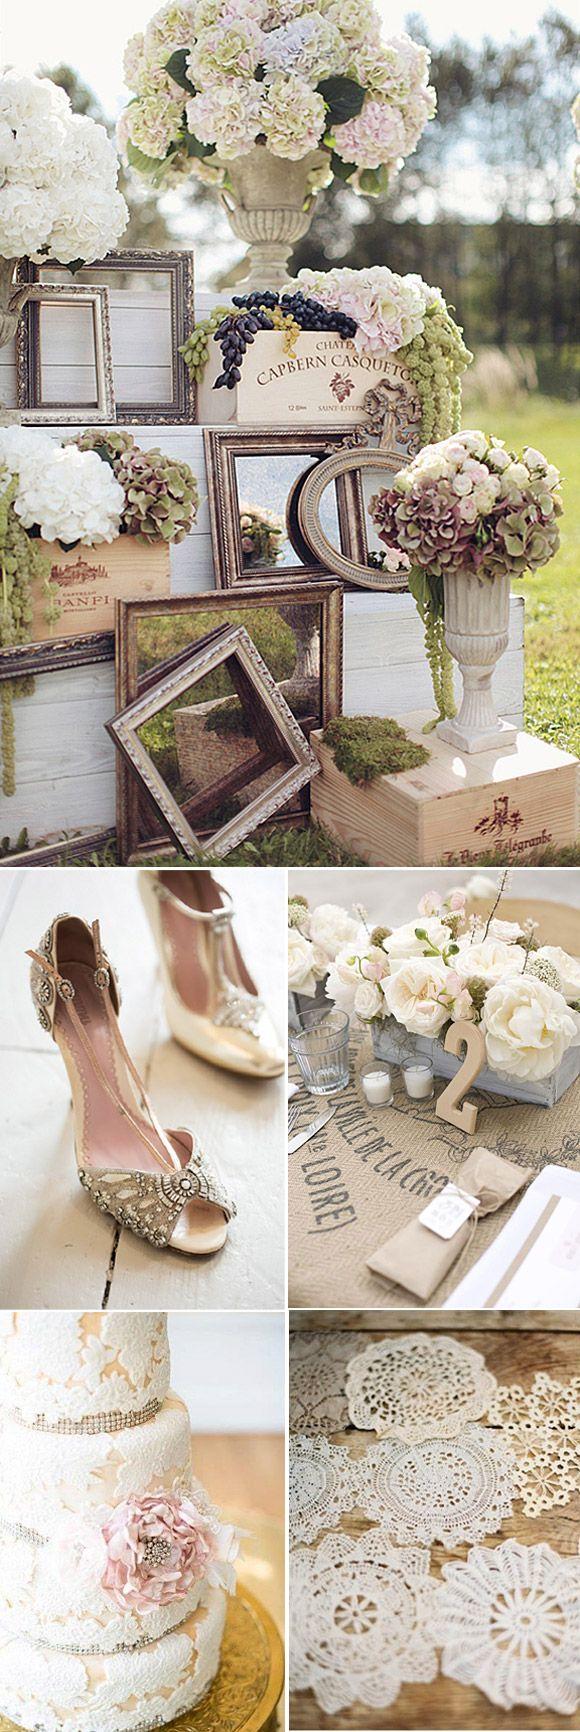 Matrimonio vintage y romántico 3